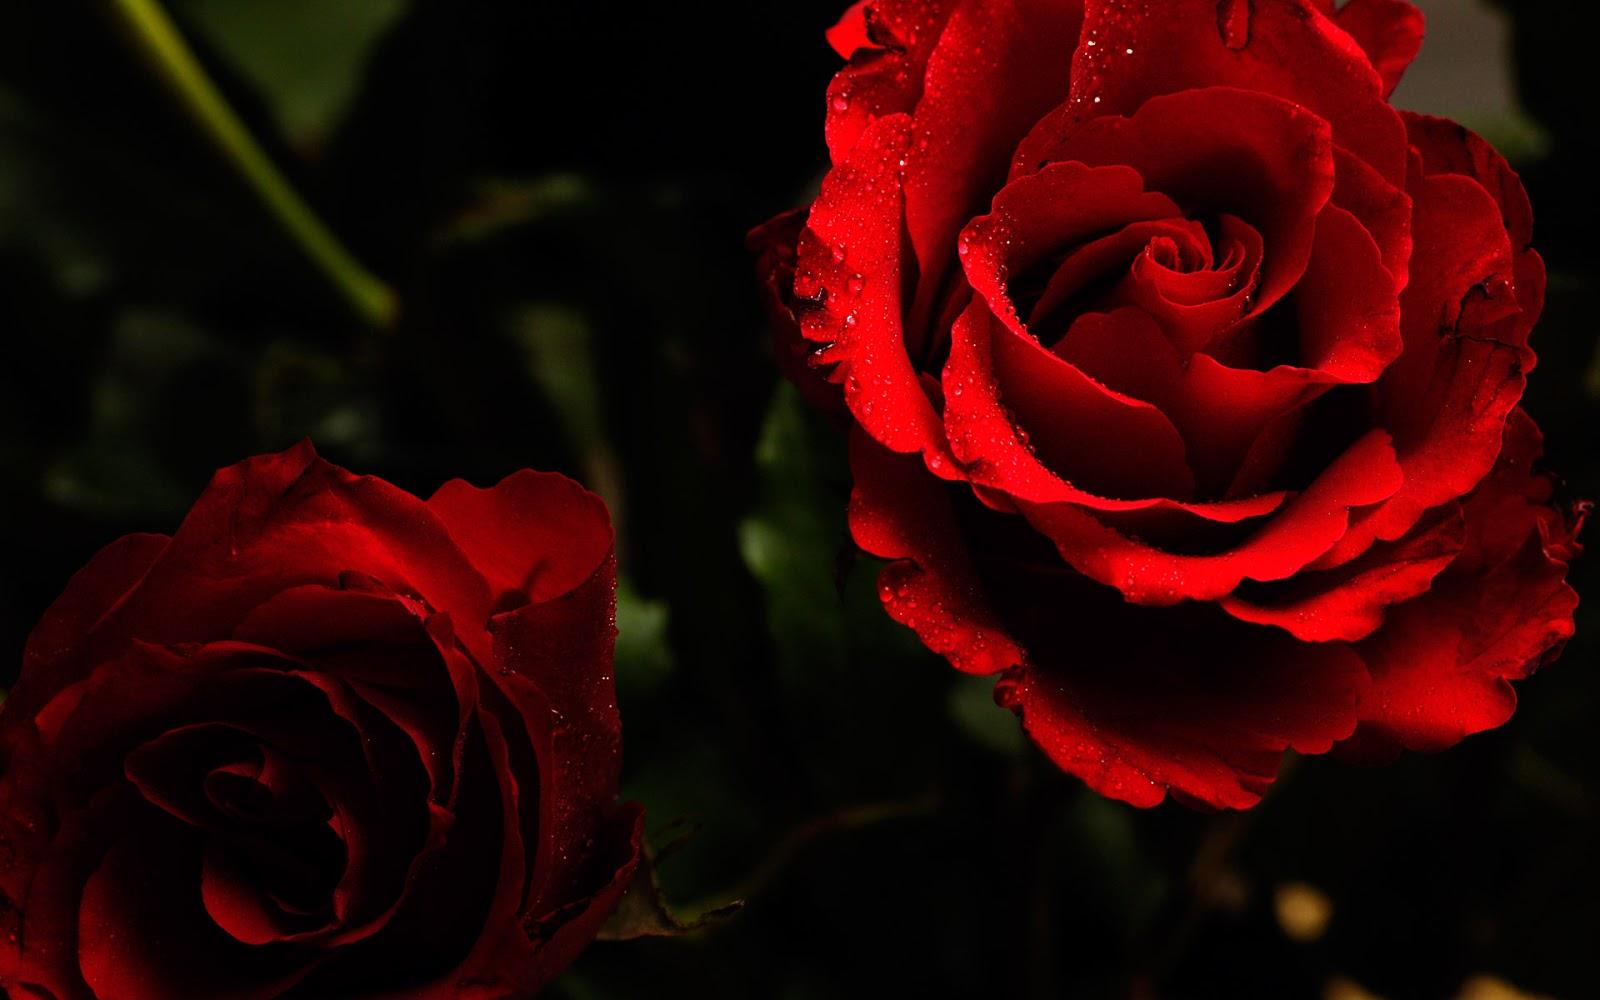 HD Rose Flower Photo